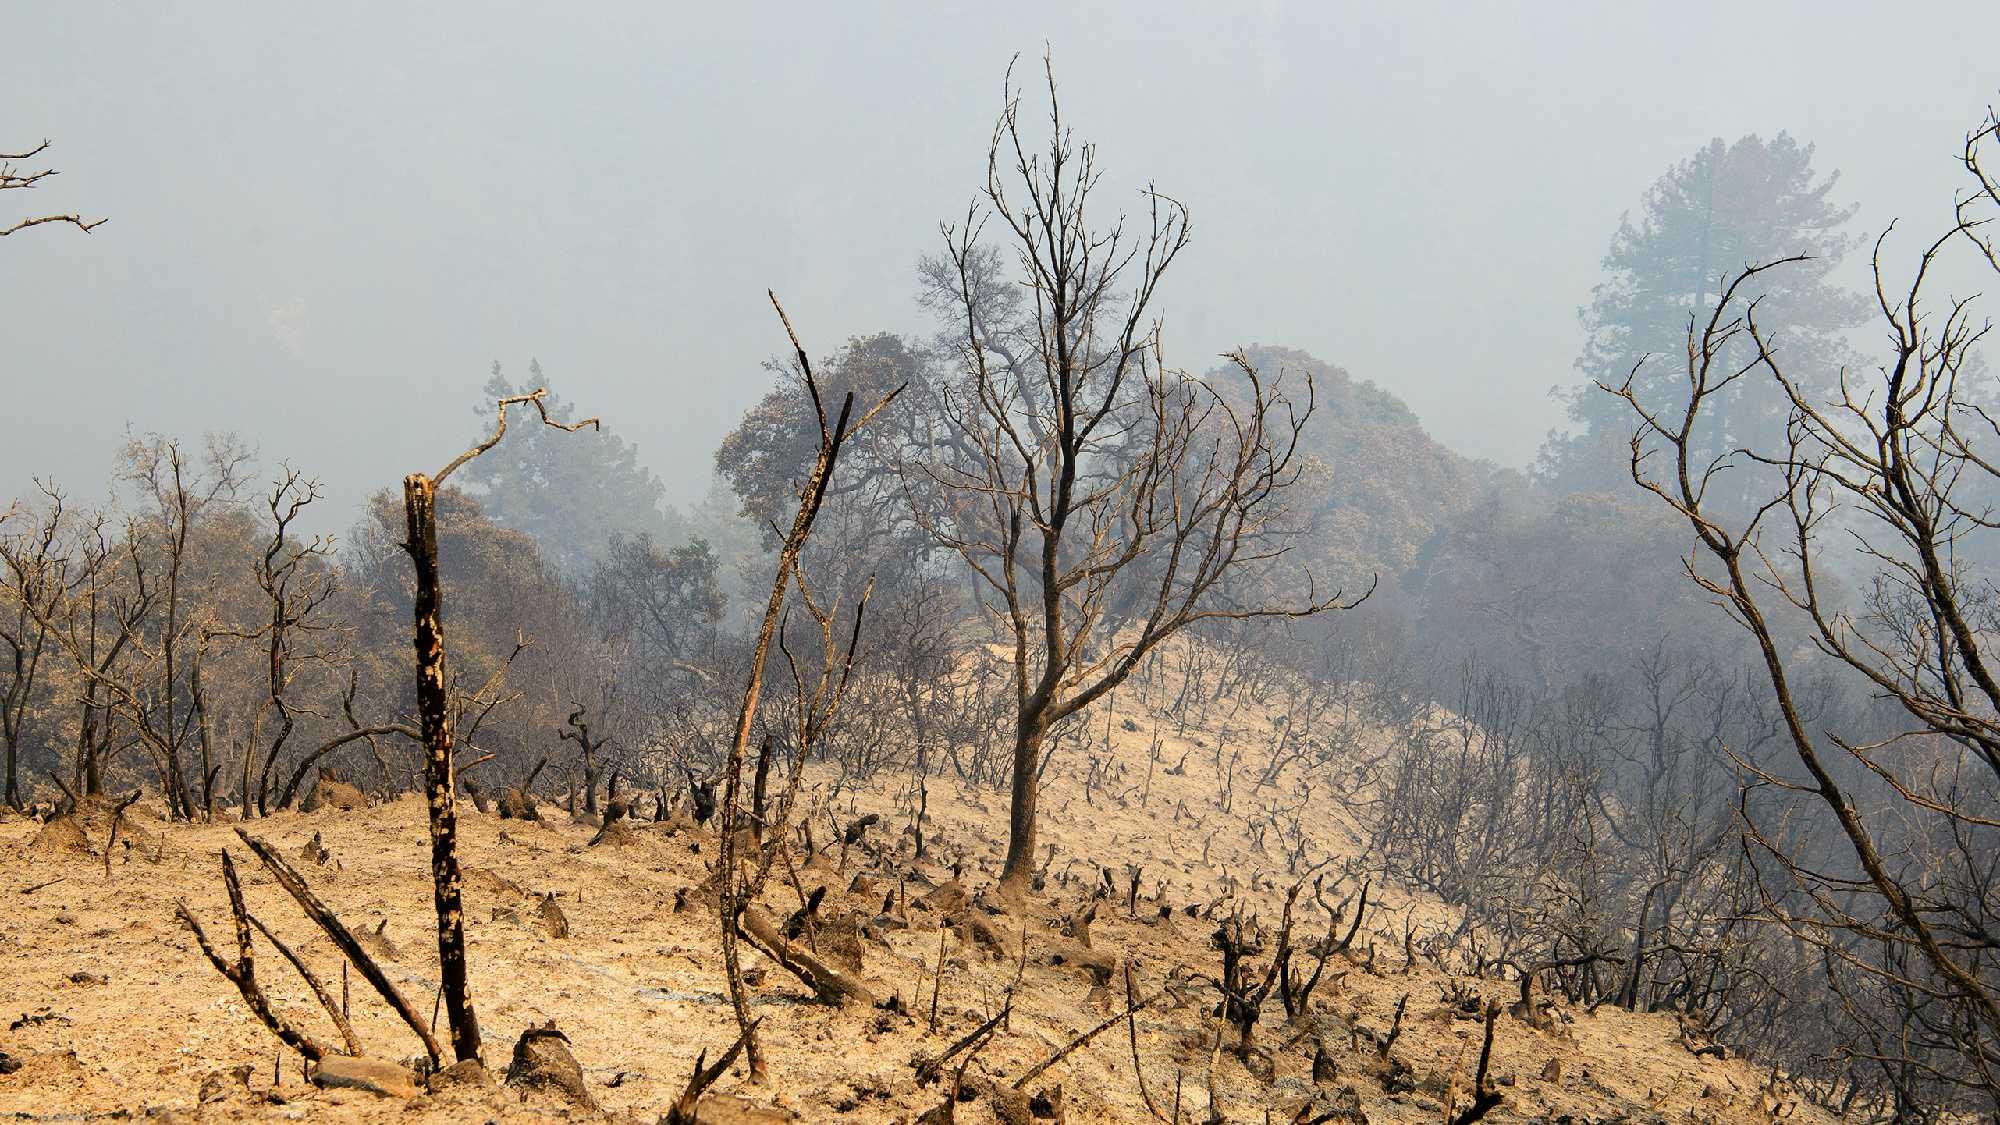 Land burned by Soberanes Fire